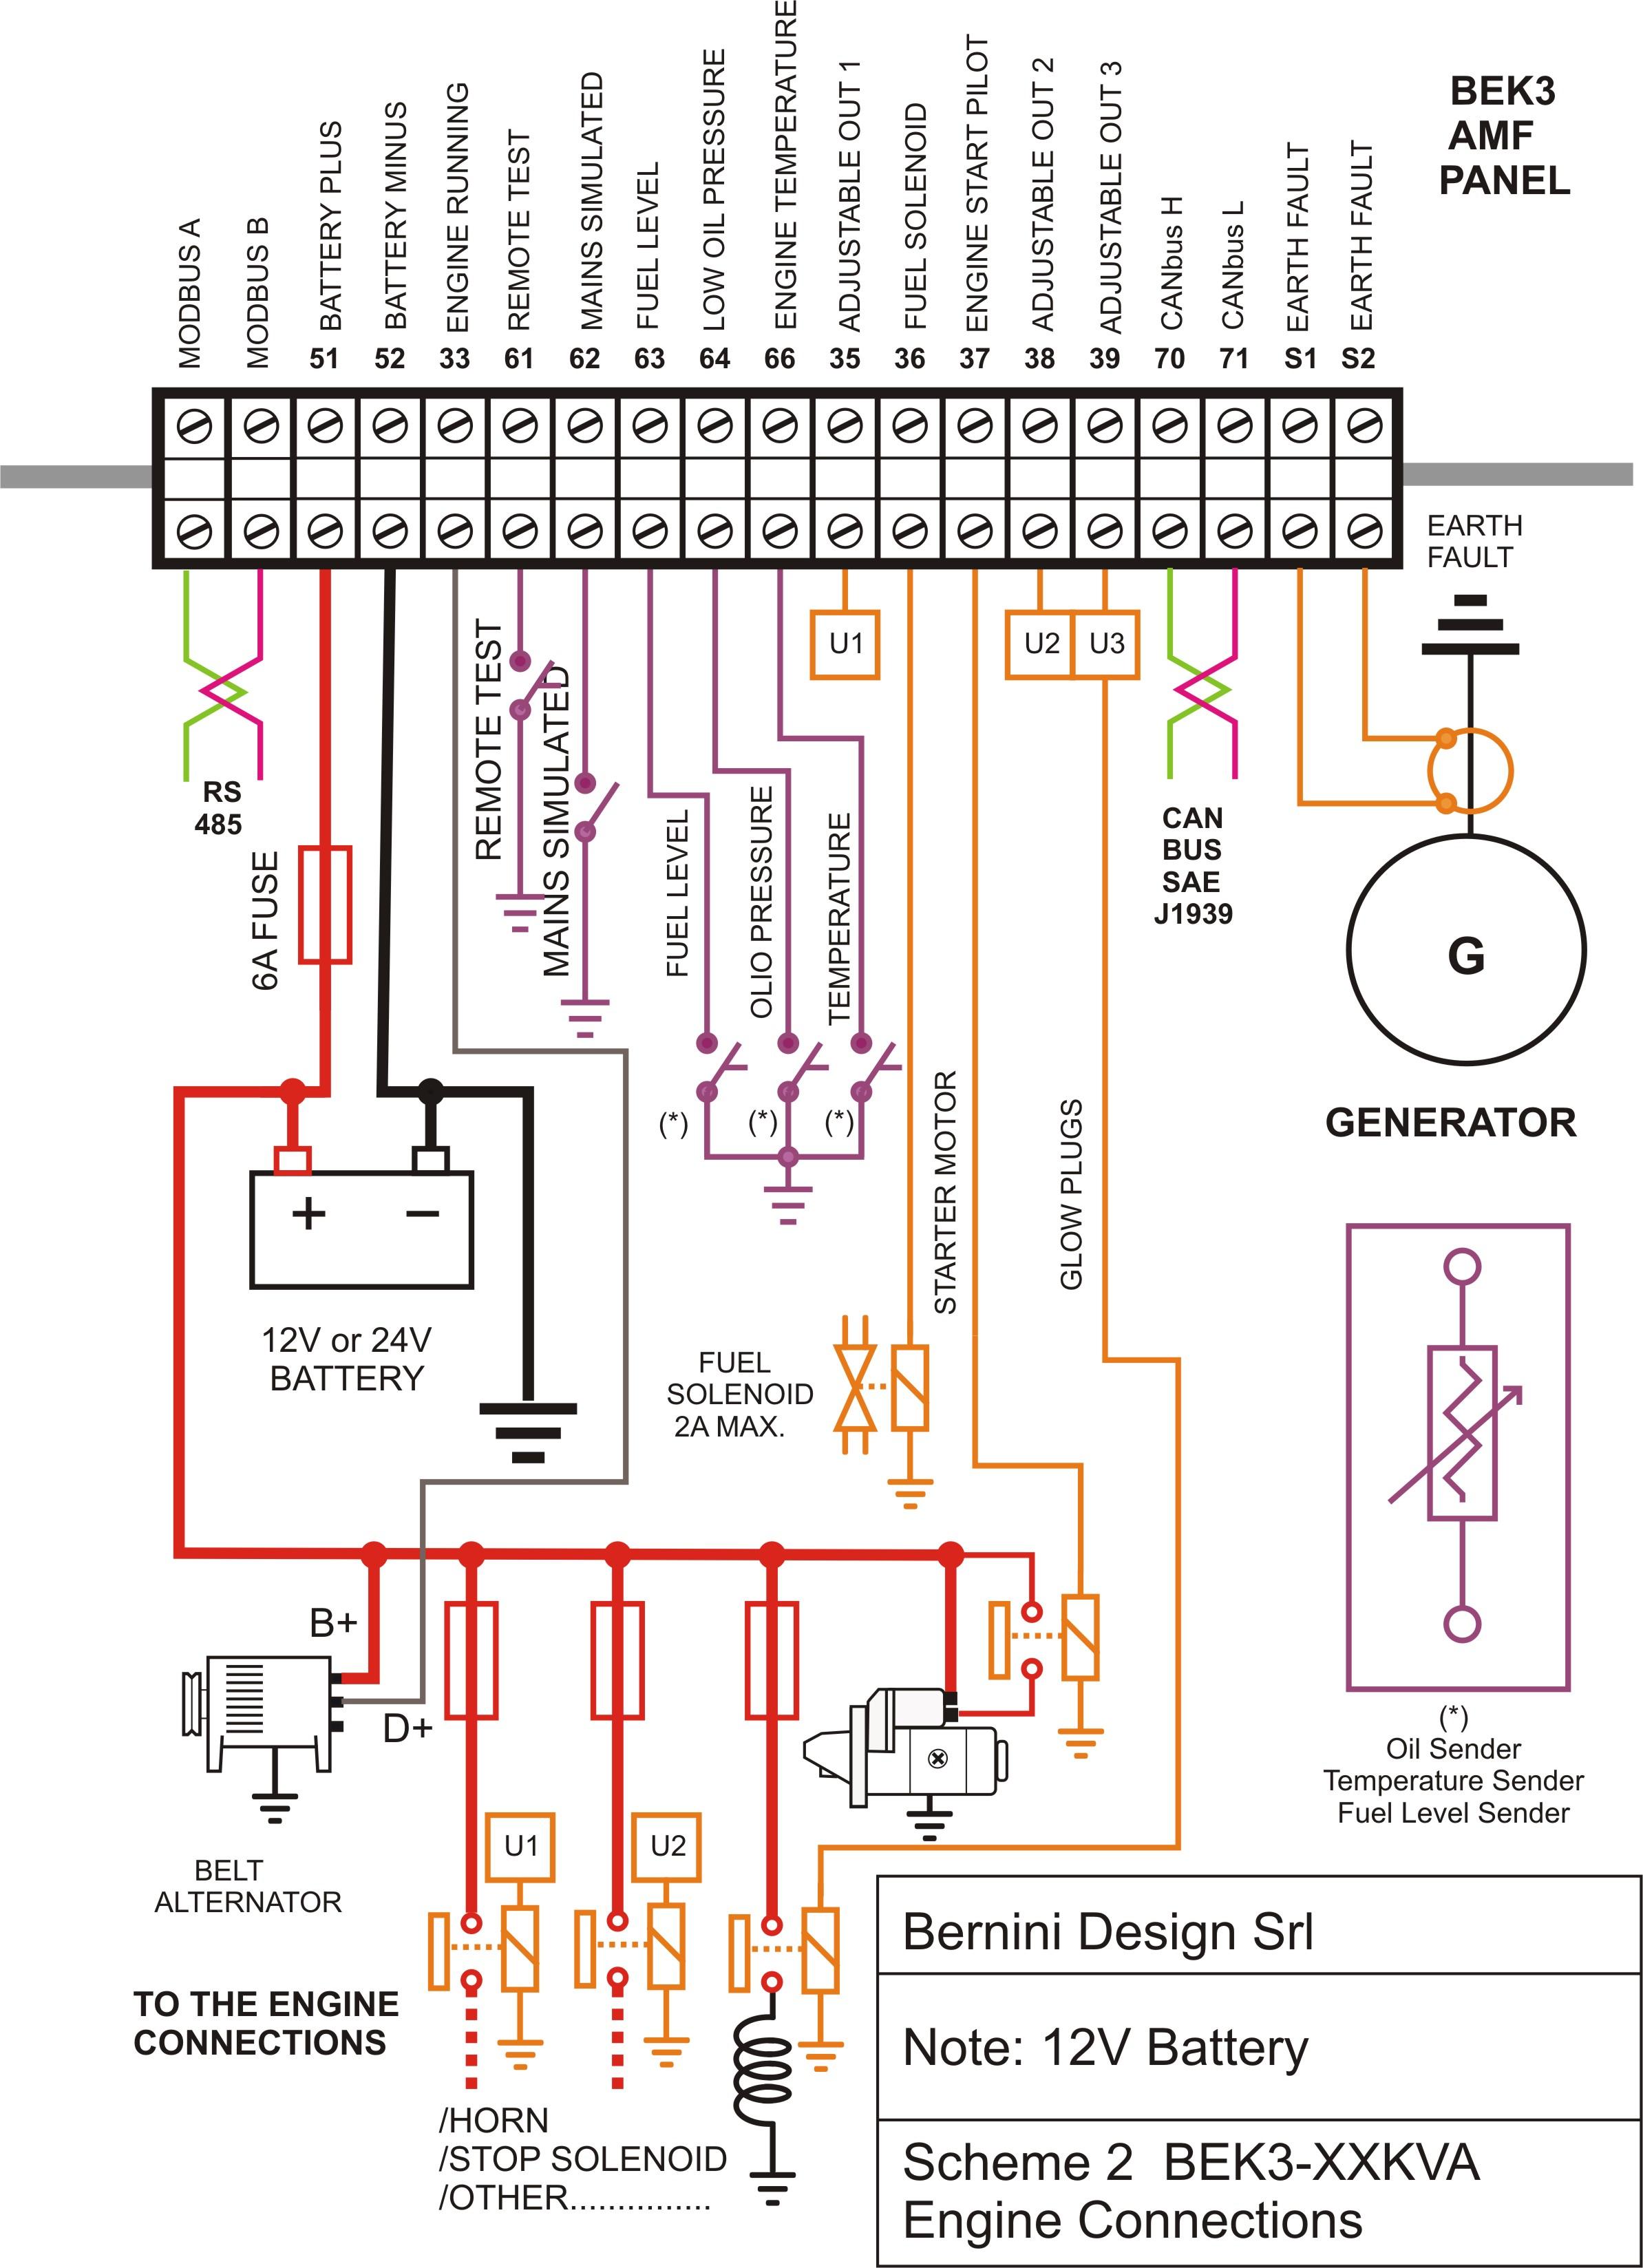 smart home wiring diagram pdf Download-2387x3295 Car Diagram Electrical Drawing Basics Pdf Zen Diagram Electric 1-f